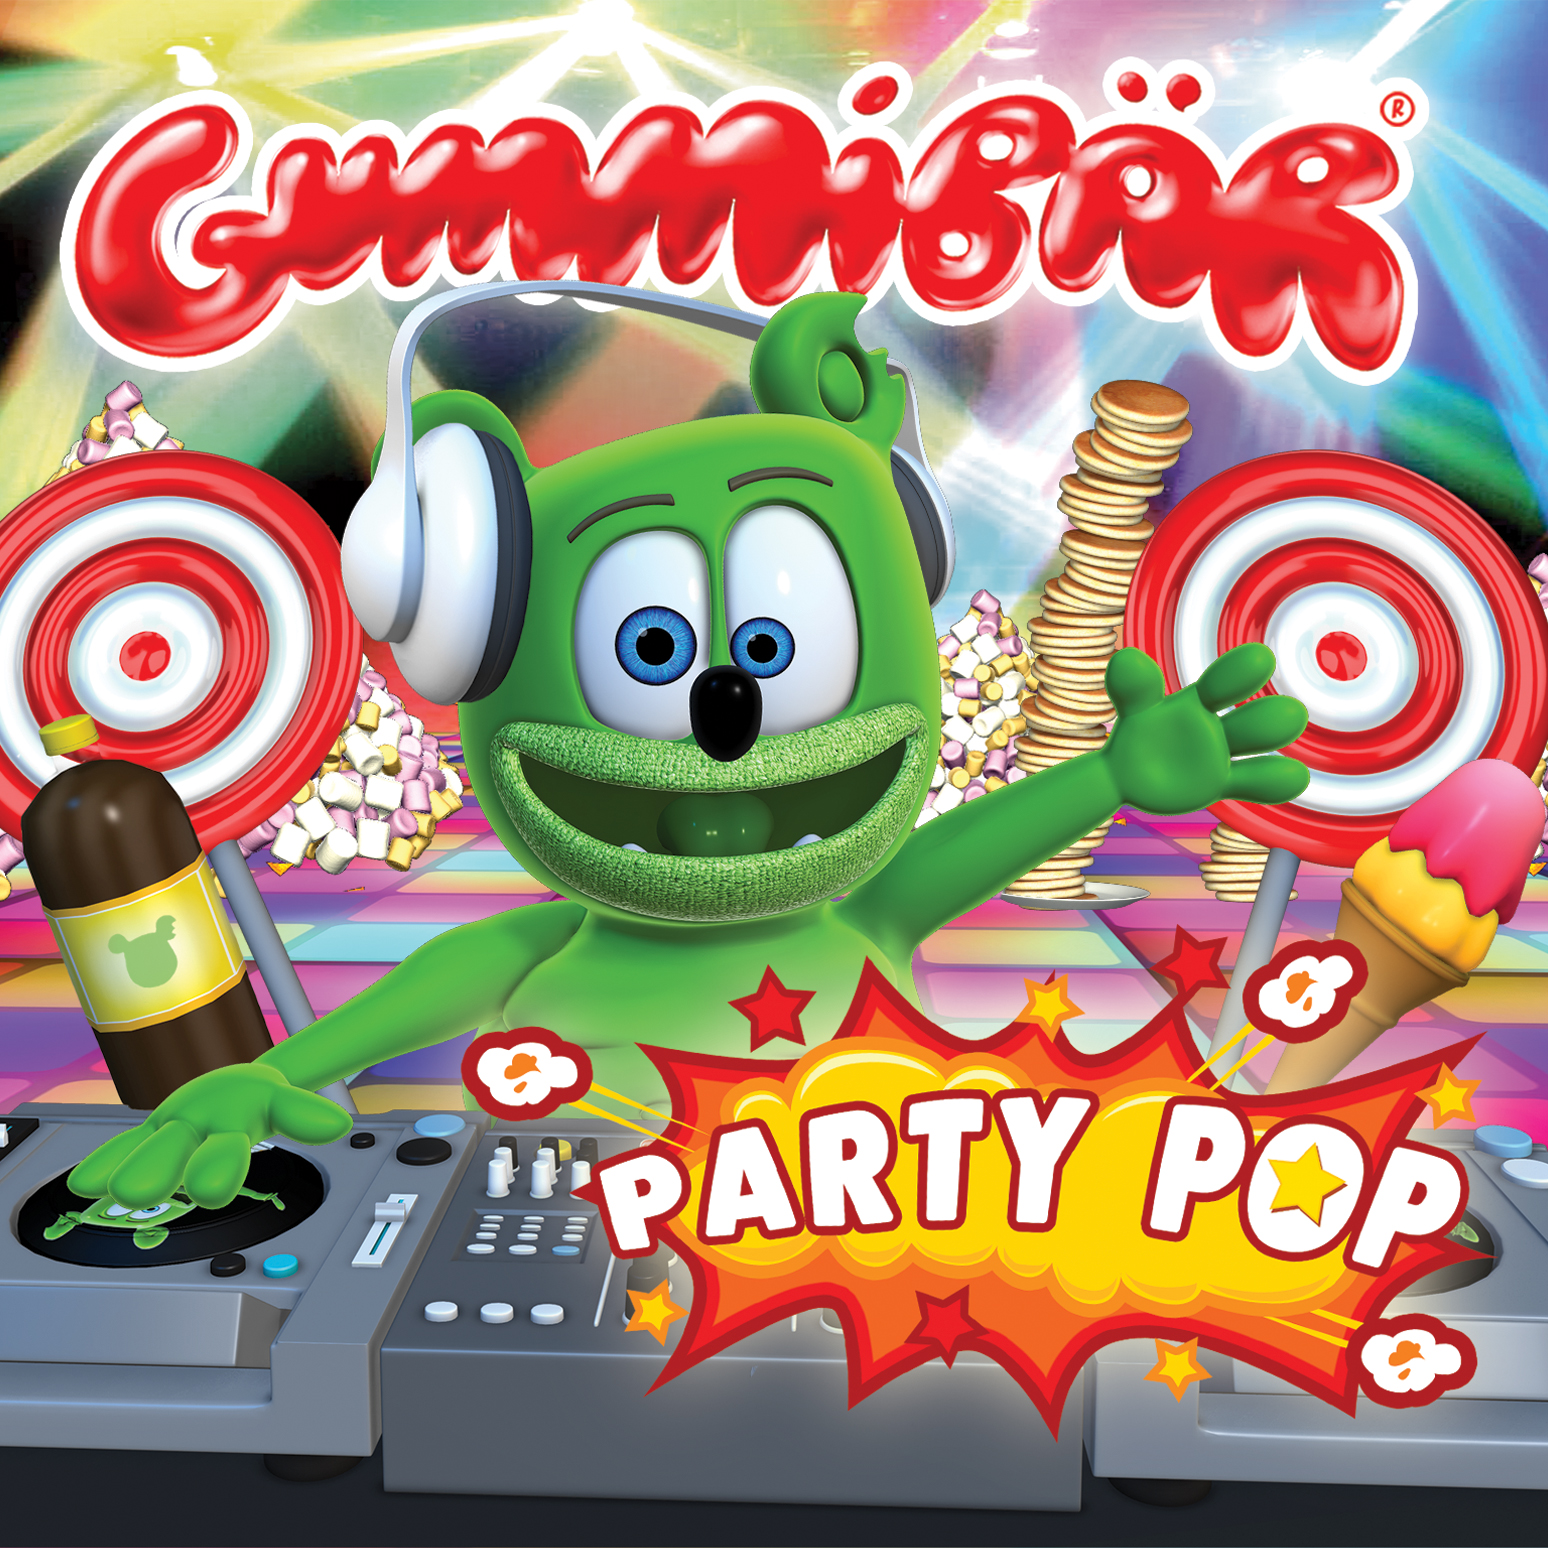 Gummybear International Releases New Gummibär Album, Party Pop